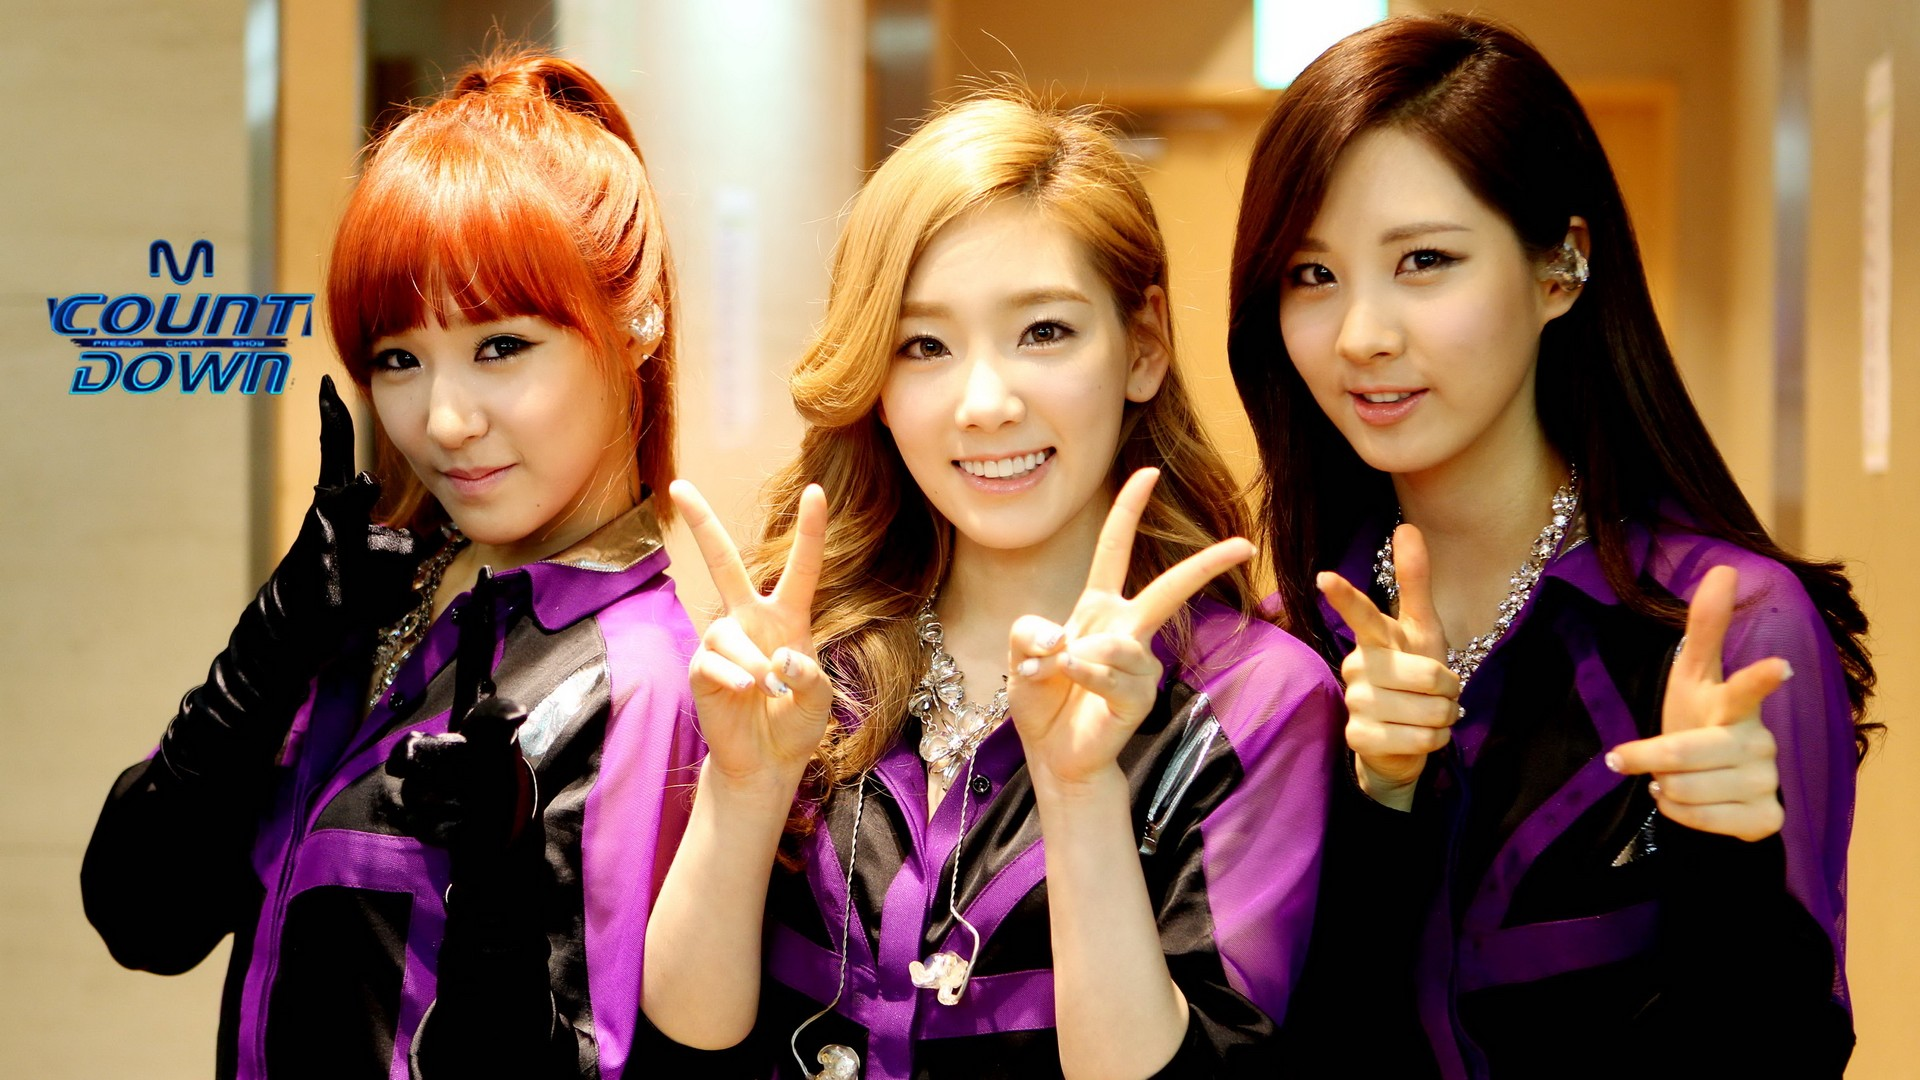 women music Girls Generation SNSD asians Seohyun Korean 1920x1080